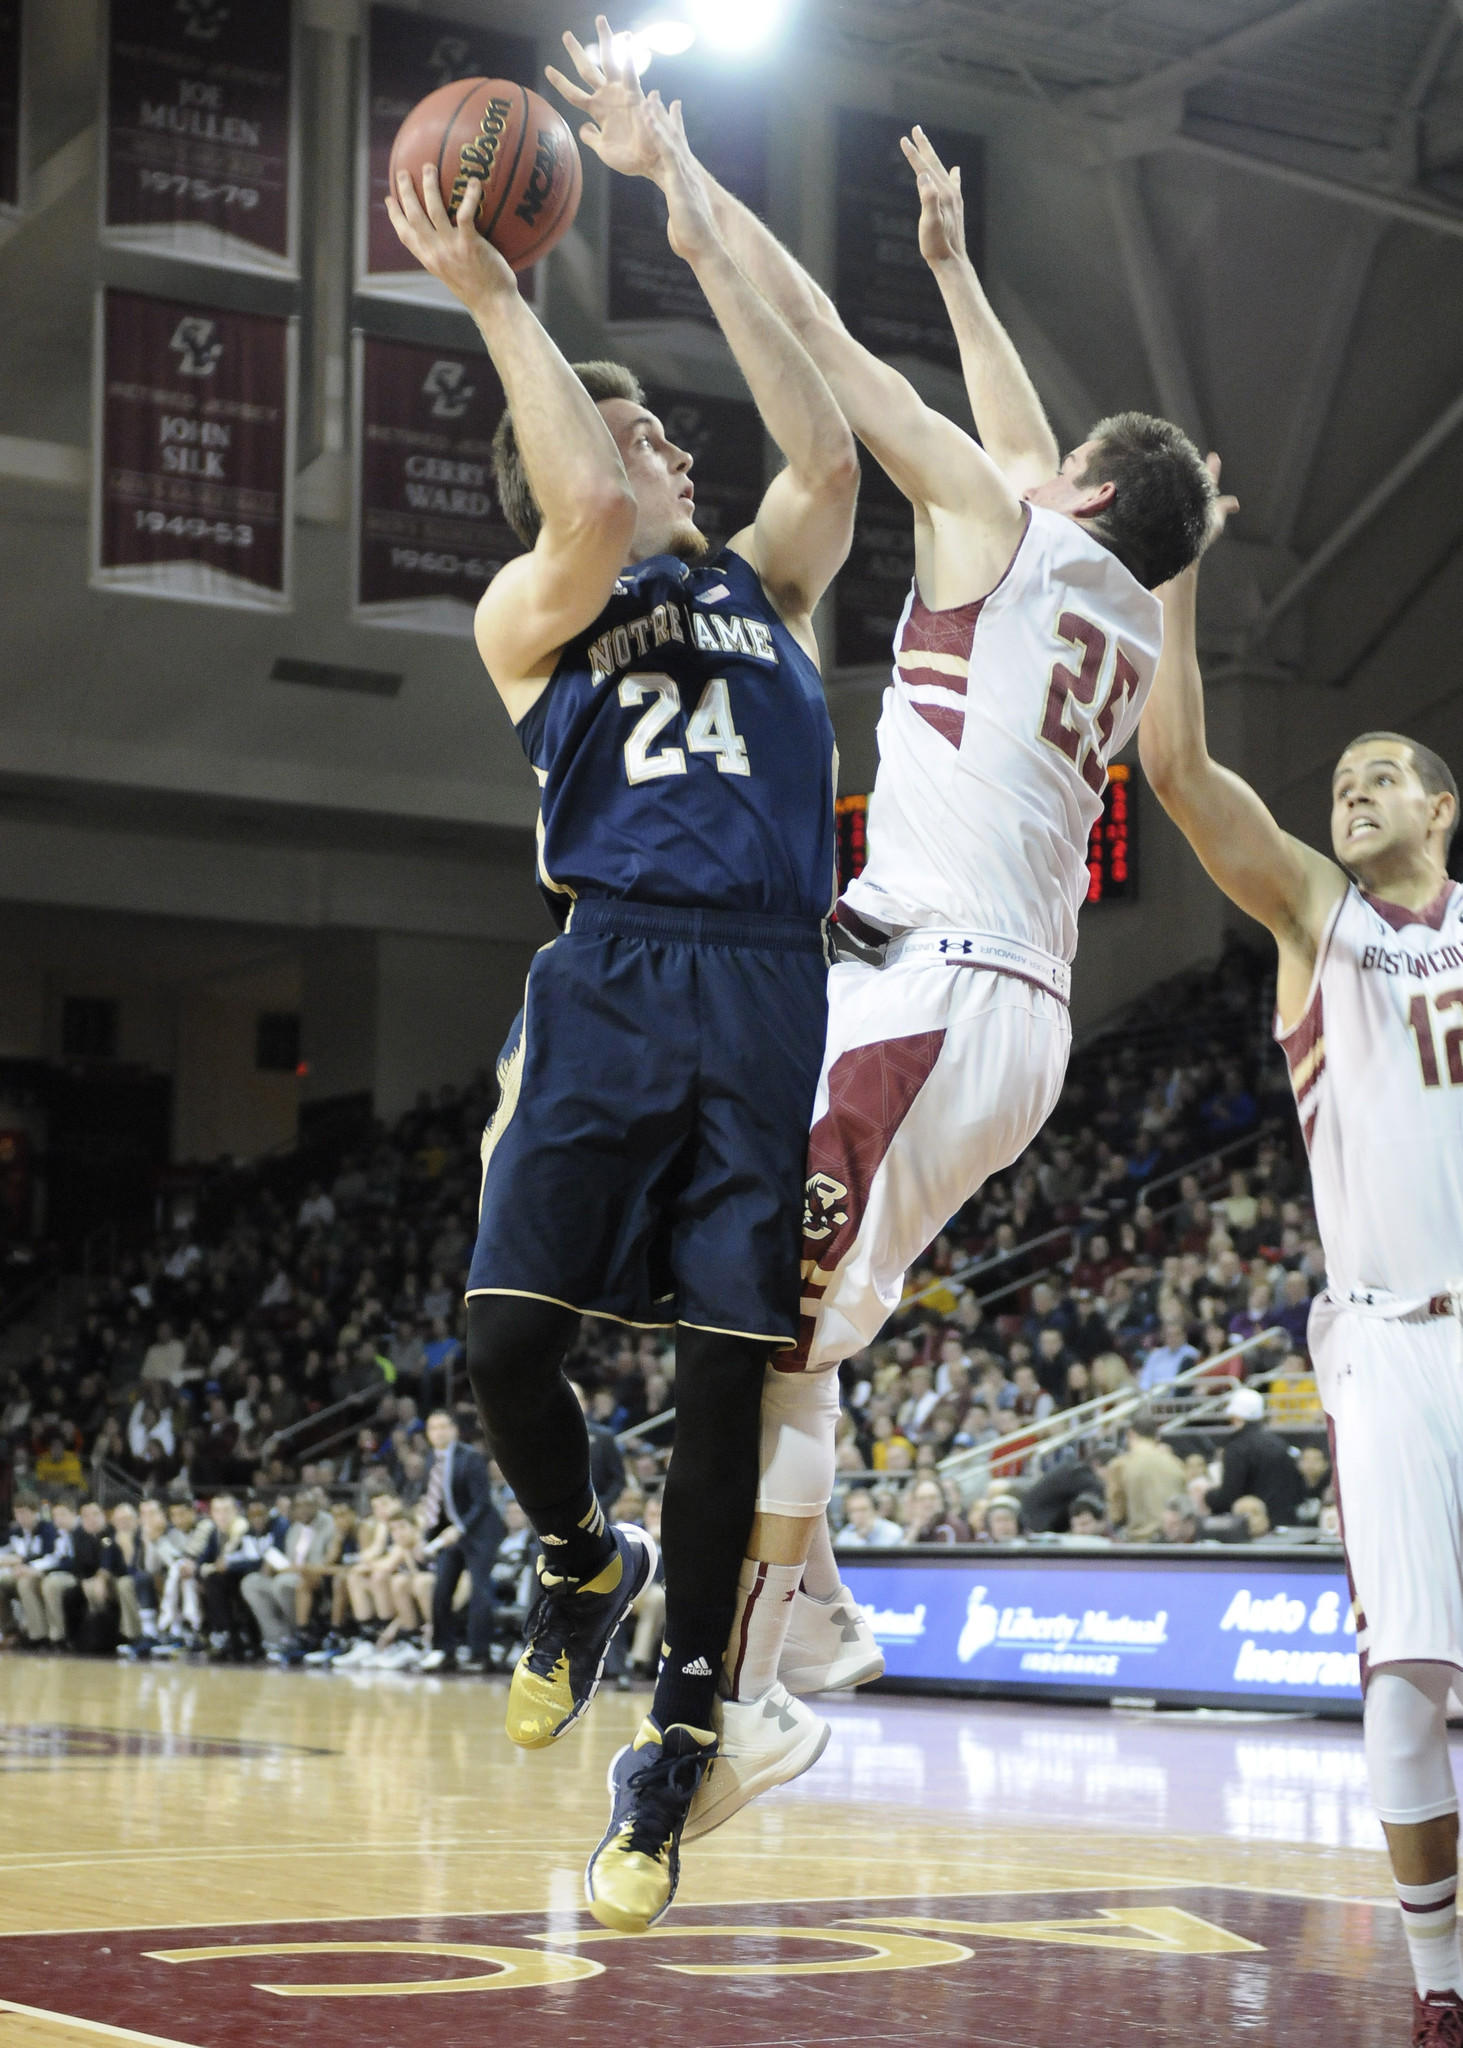 Pat Connaughton shoots the ball over Boston College's Joe Rahon during the first half at Silvio O. Conte Forum.